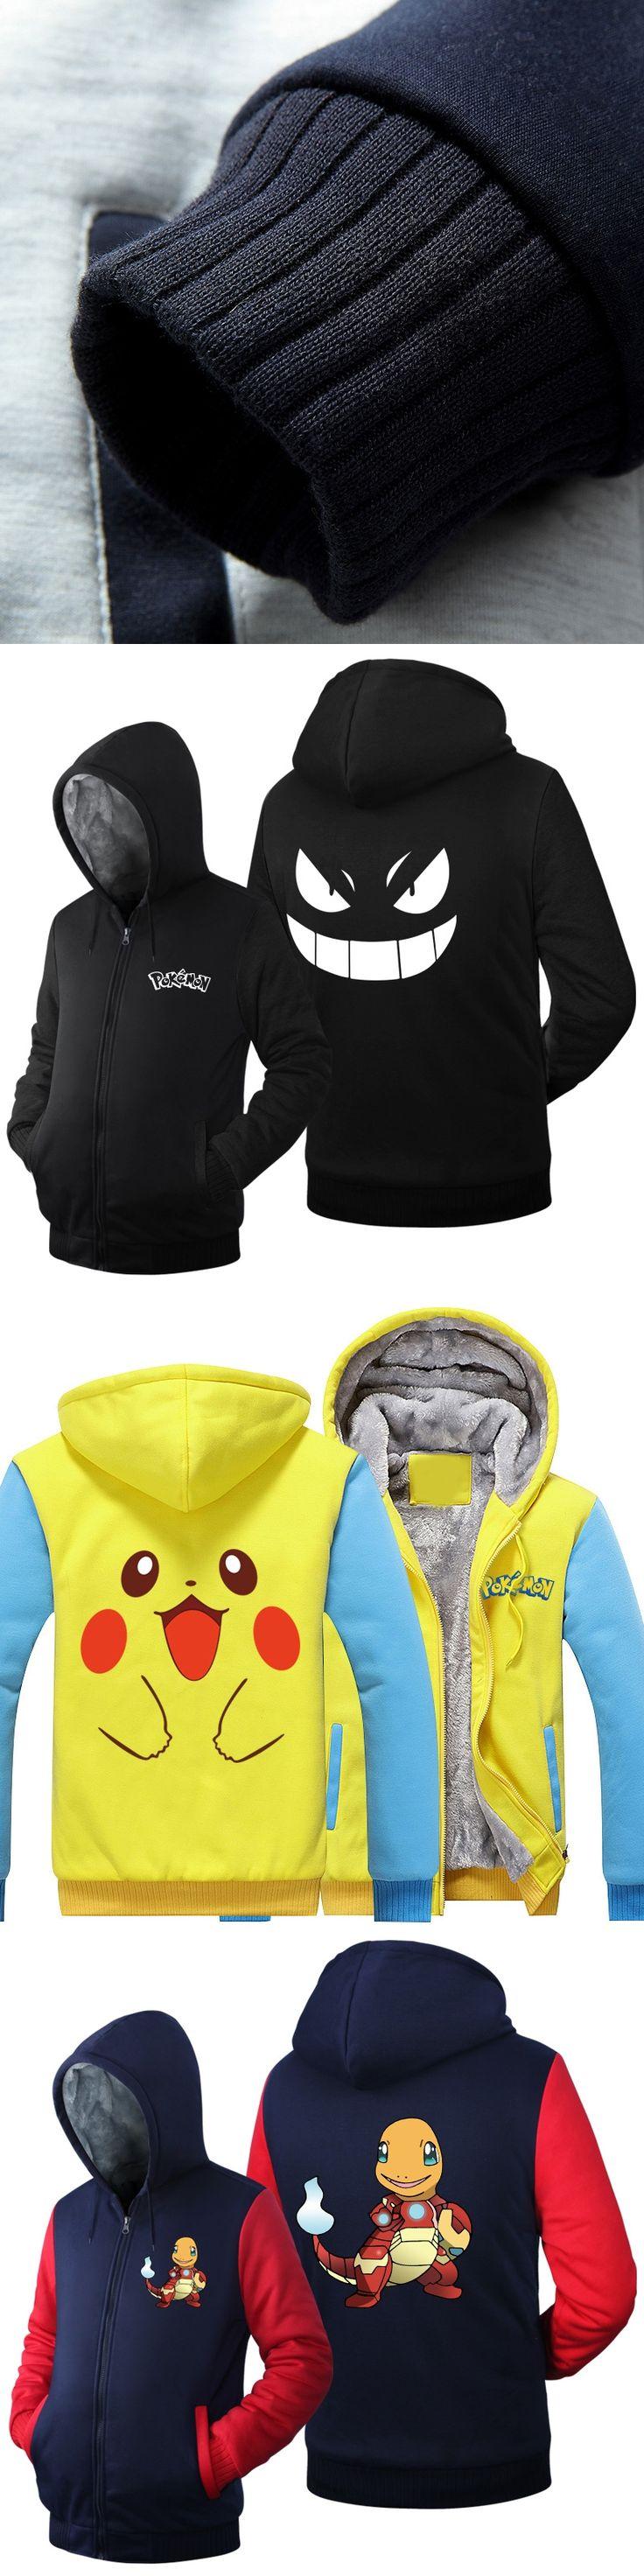 Pokemon Go Hoodies Anime Pikachu Gengar Cosplay Jacket Coat Cartoon Pocket Monster Winter Thick Zipper Sweatshirts For Men